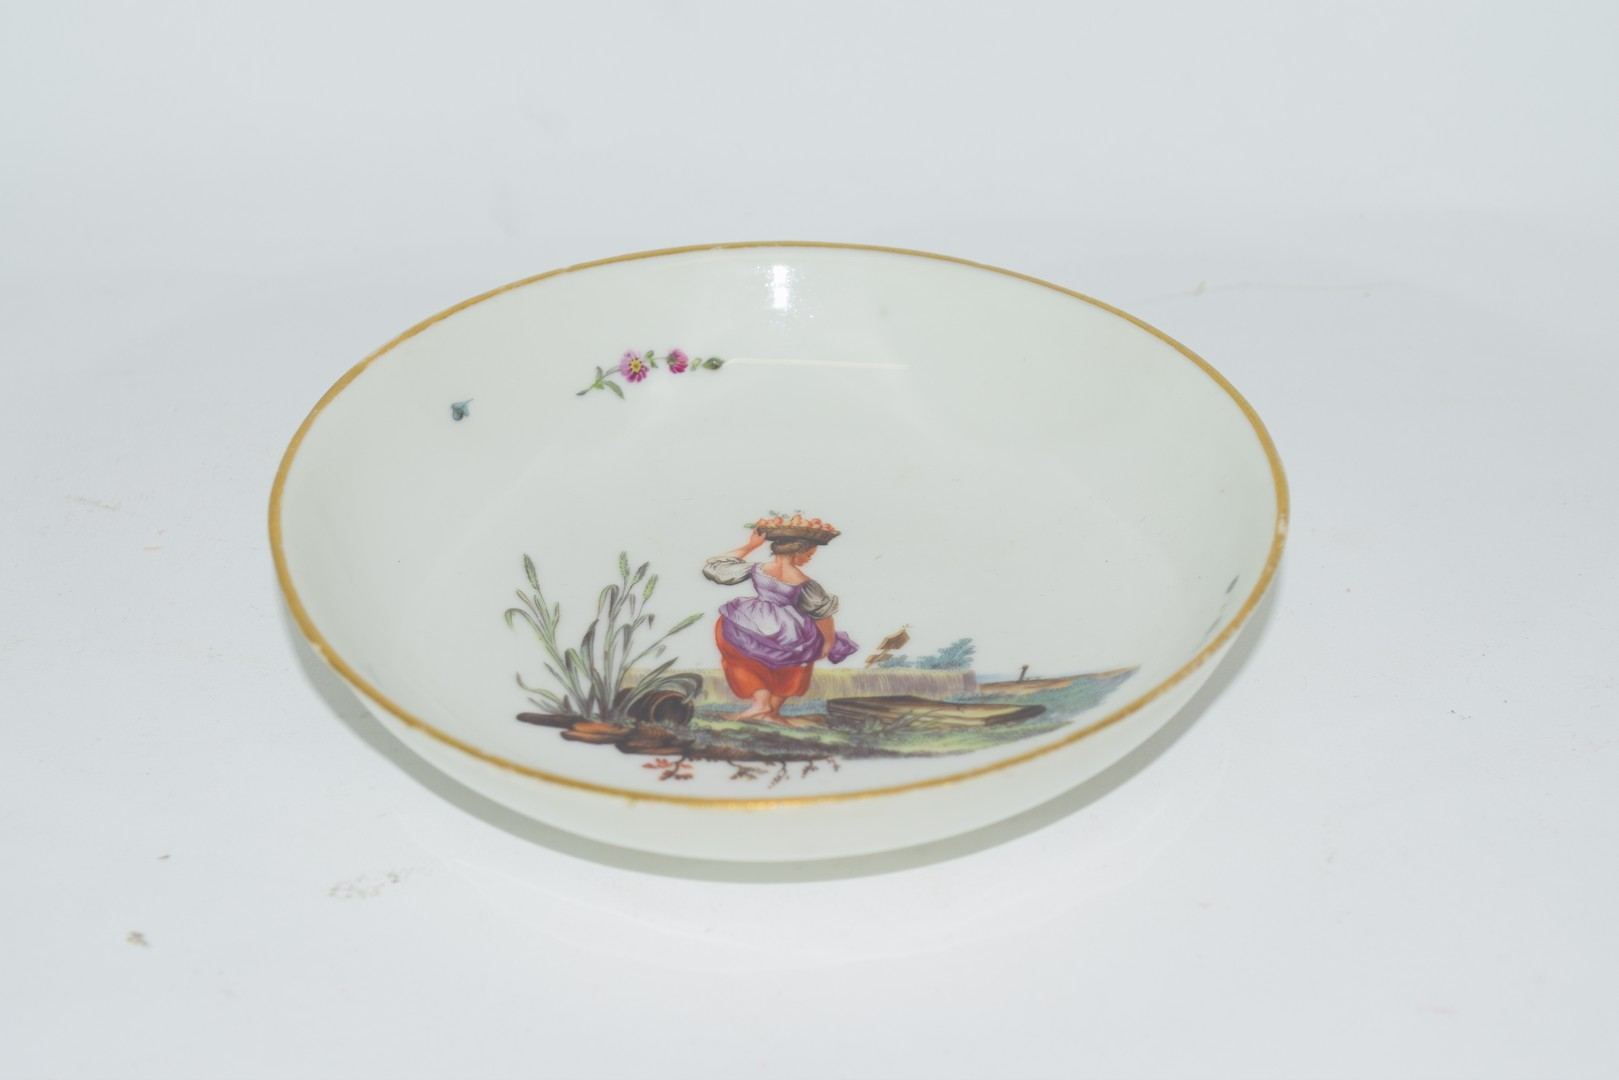 18th century Hochst porcelain saucer - Image 2 of 3